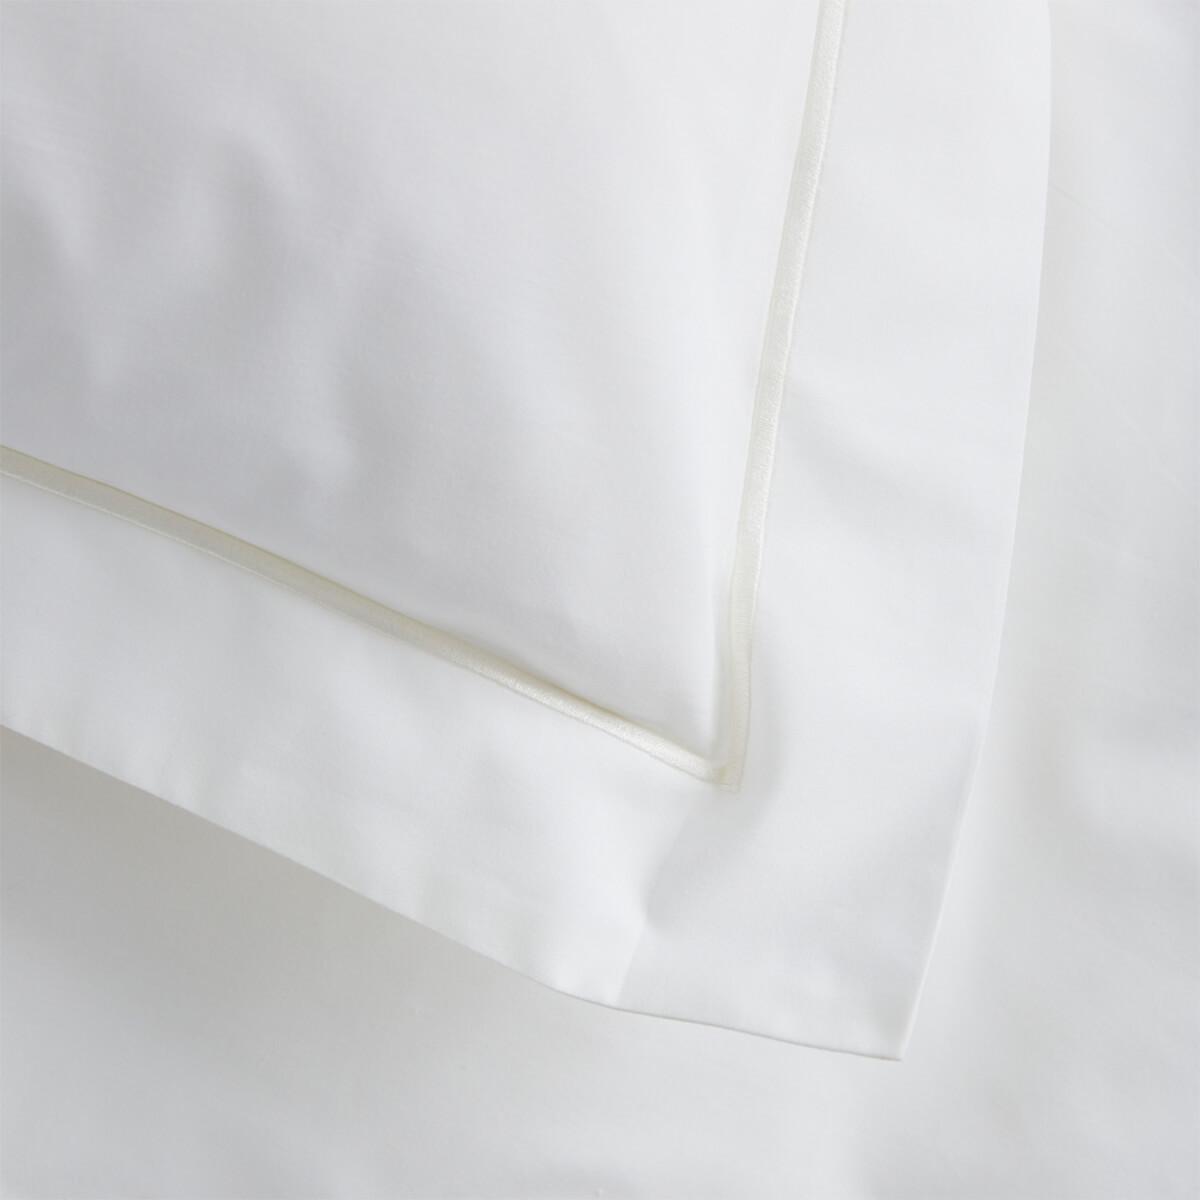 Ivory 200 Thread Count Egyptian Cotton Standard Oxford Pillowcase Pair